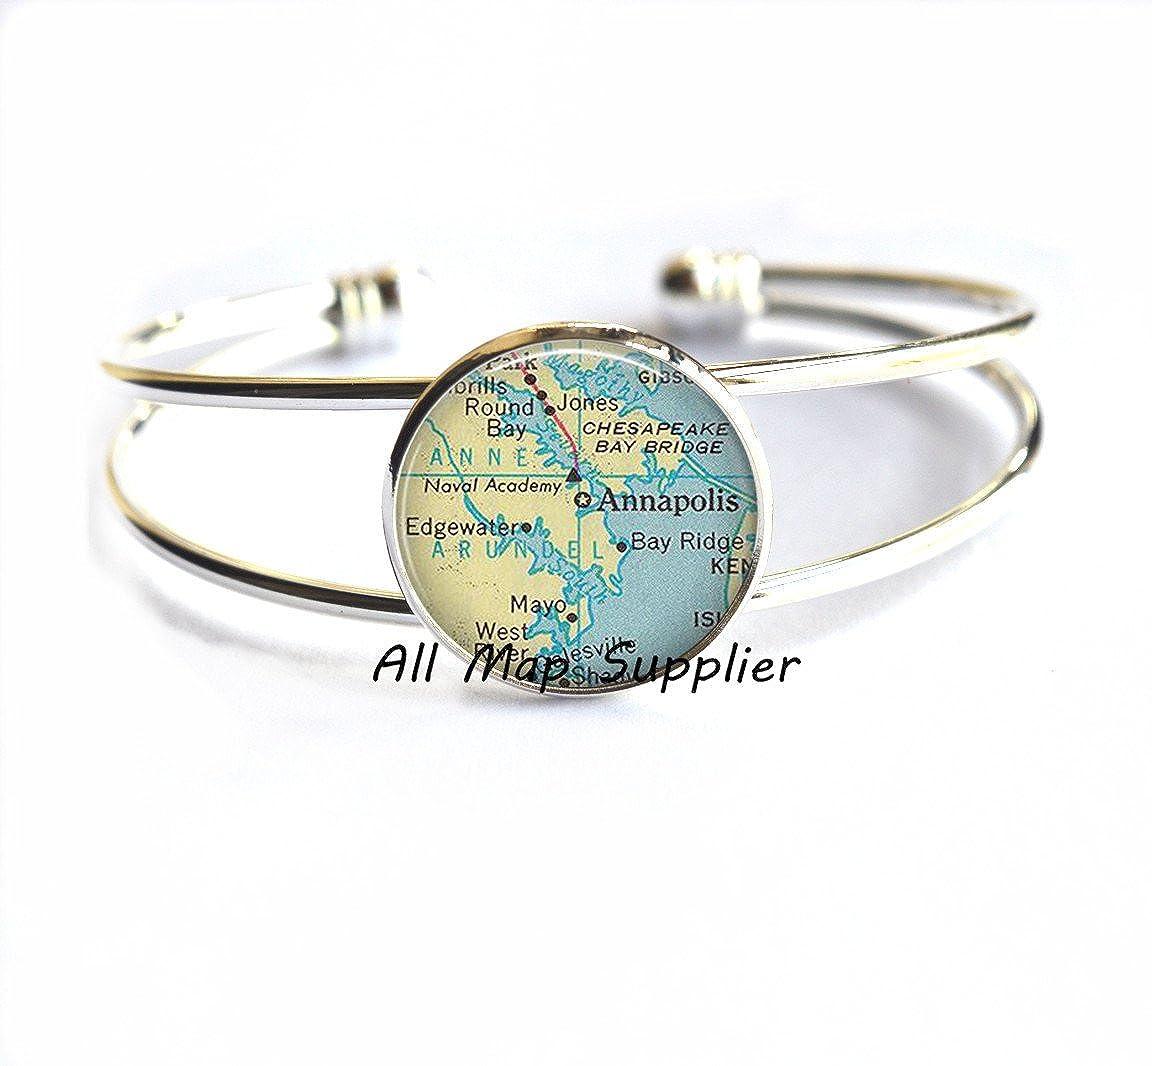 Anaapolis Bracelets map jewelry,A0267 Maryland map Bracelet Annapolis map Bracelet Annapolis map Bracelets Charming Bracelet,Annapolis